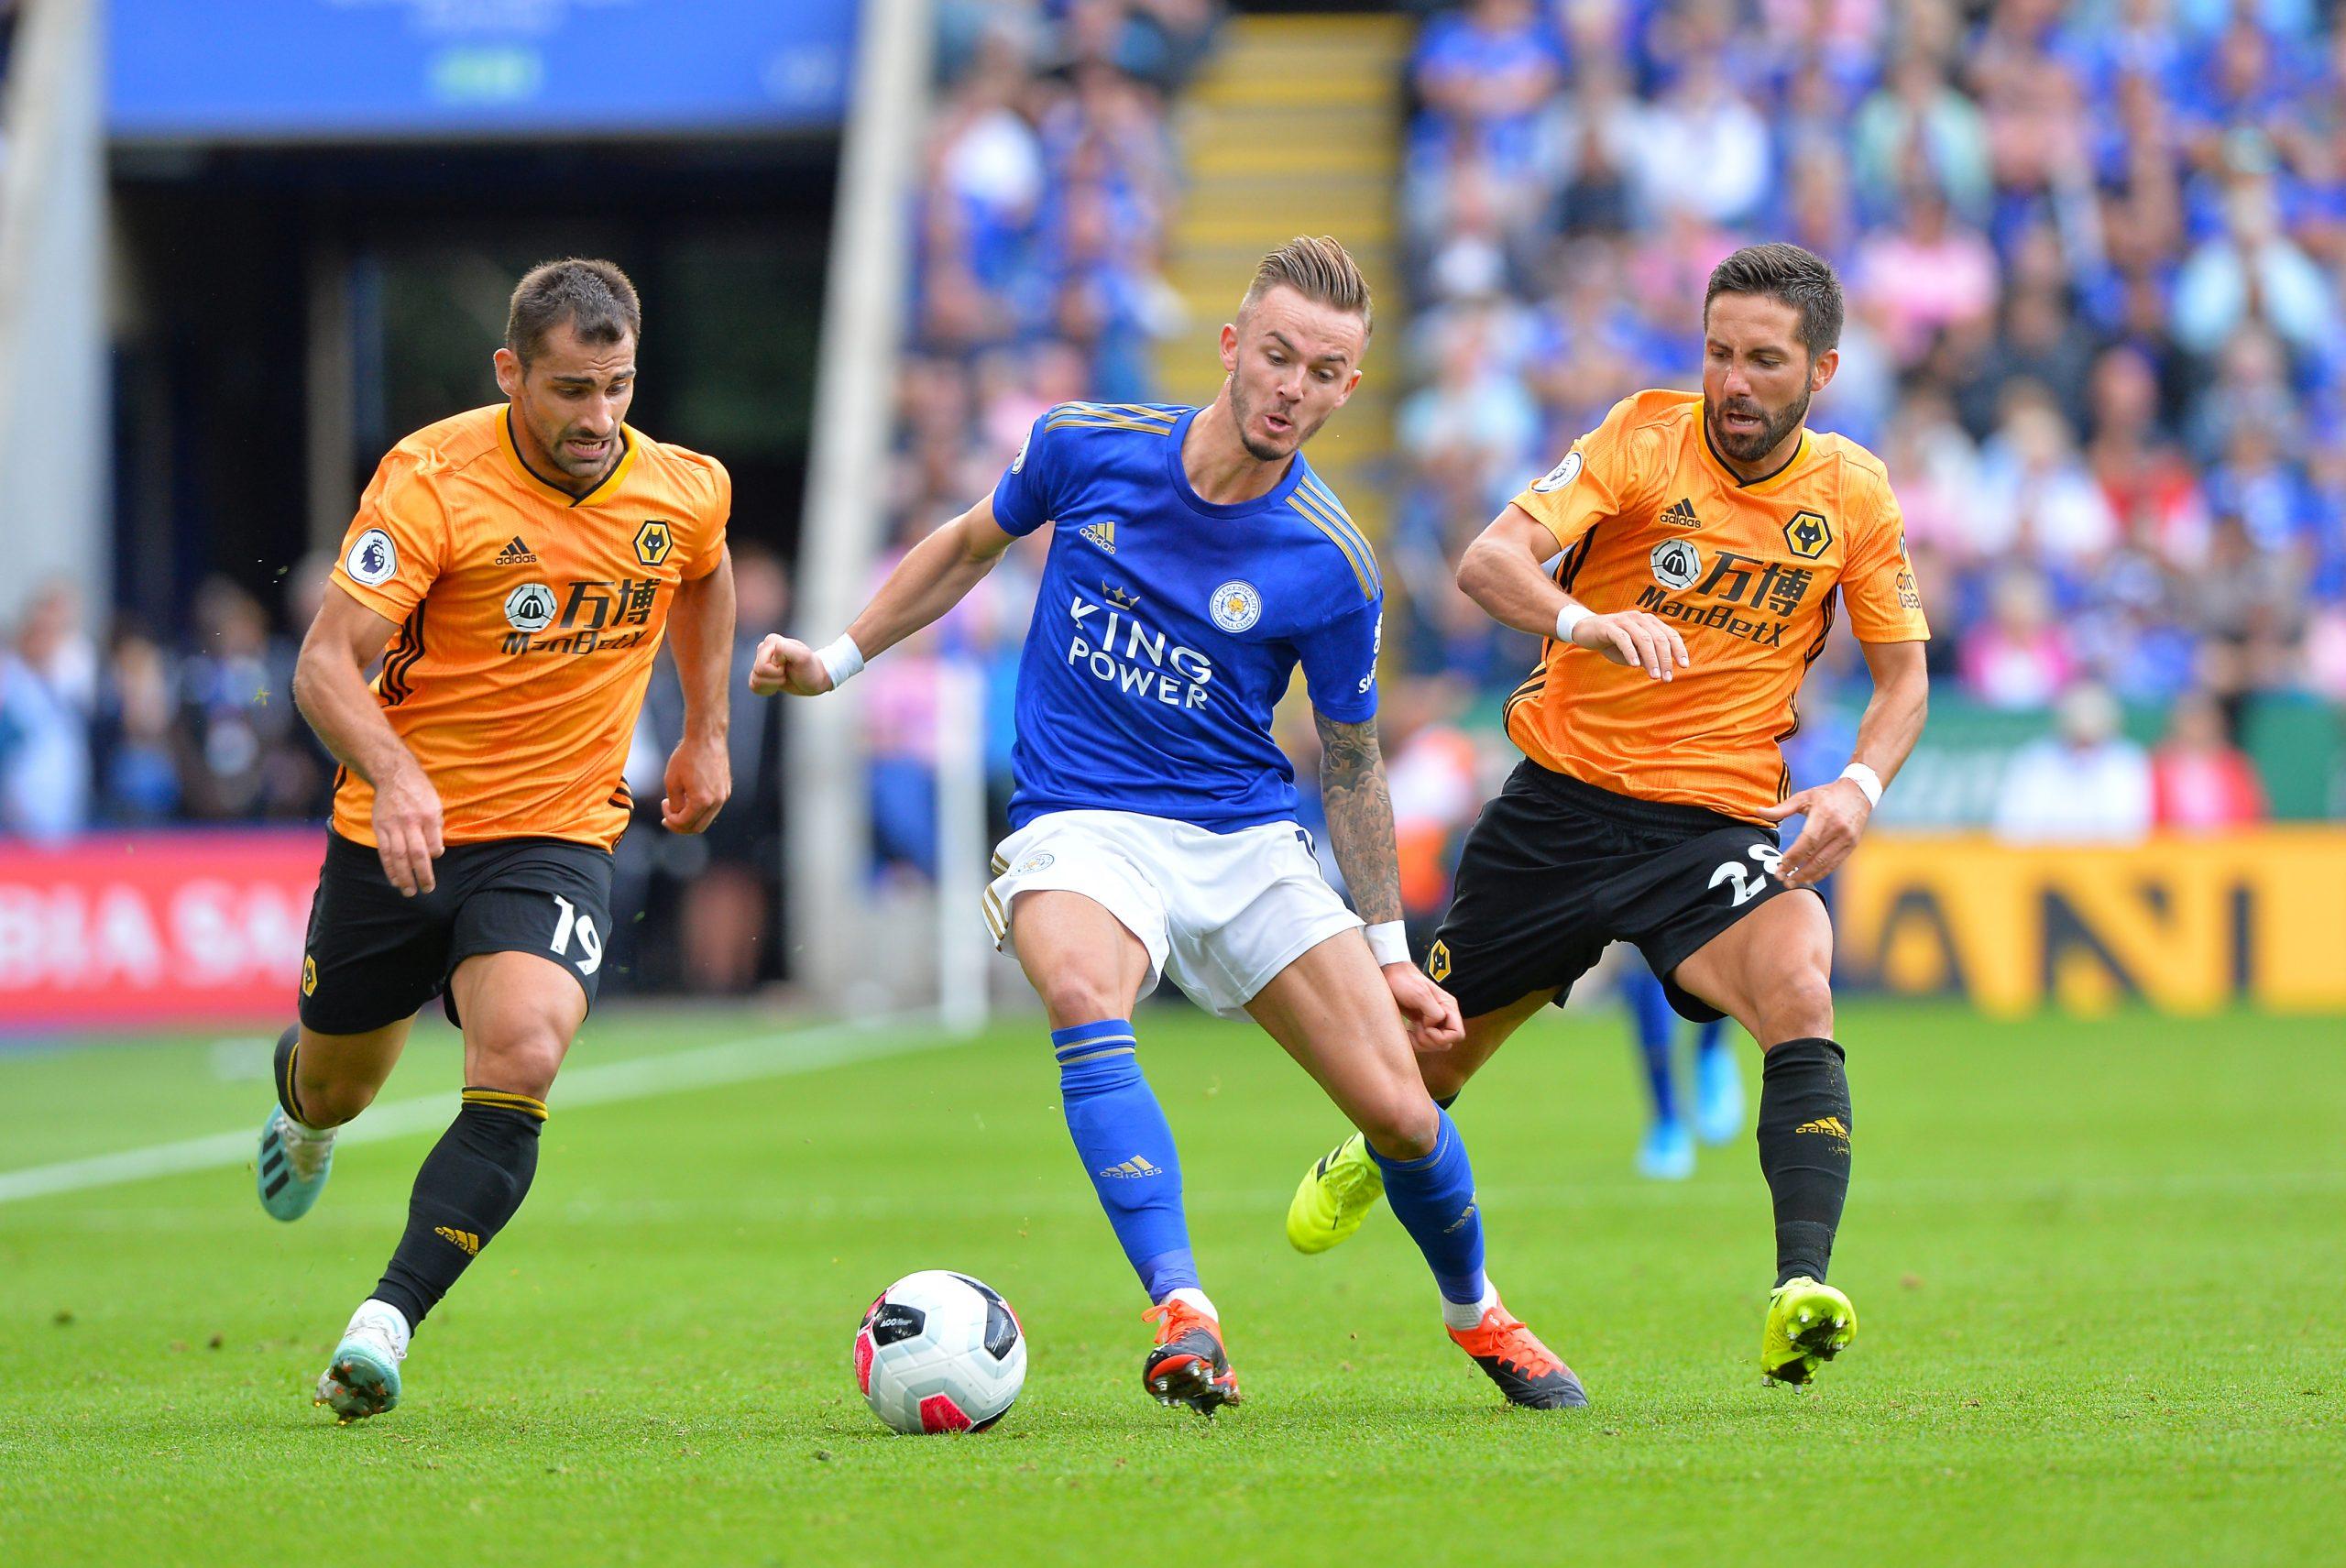 Link xem trực tiếp Leicester vs Wolves 21h00 ngày 8/11